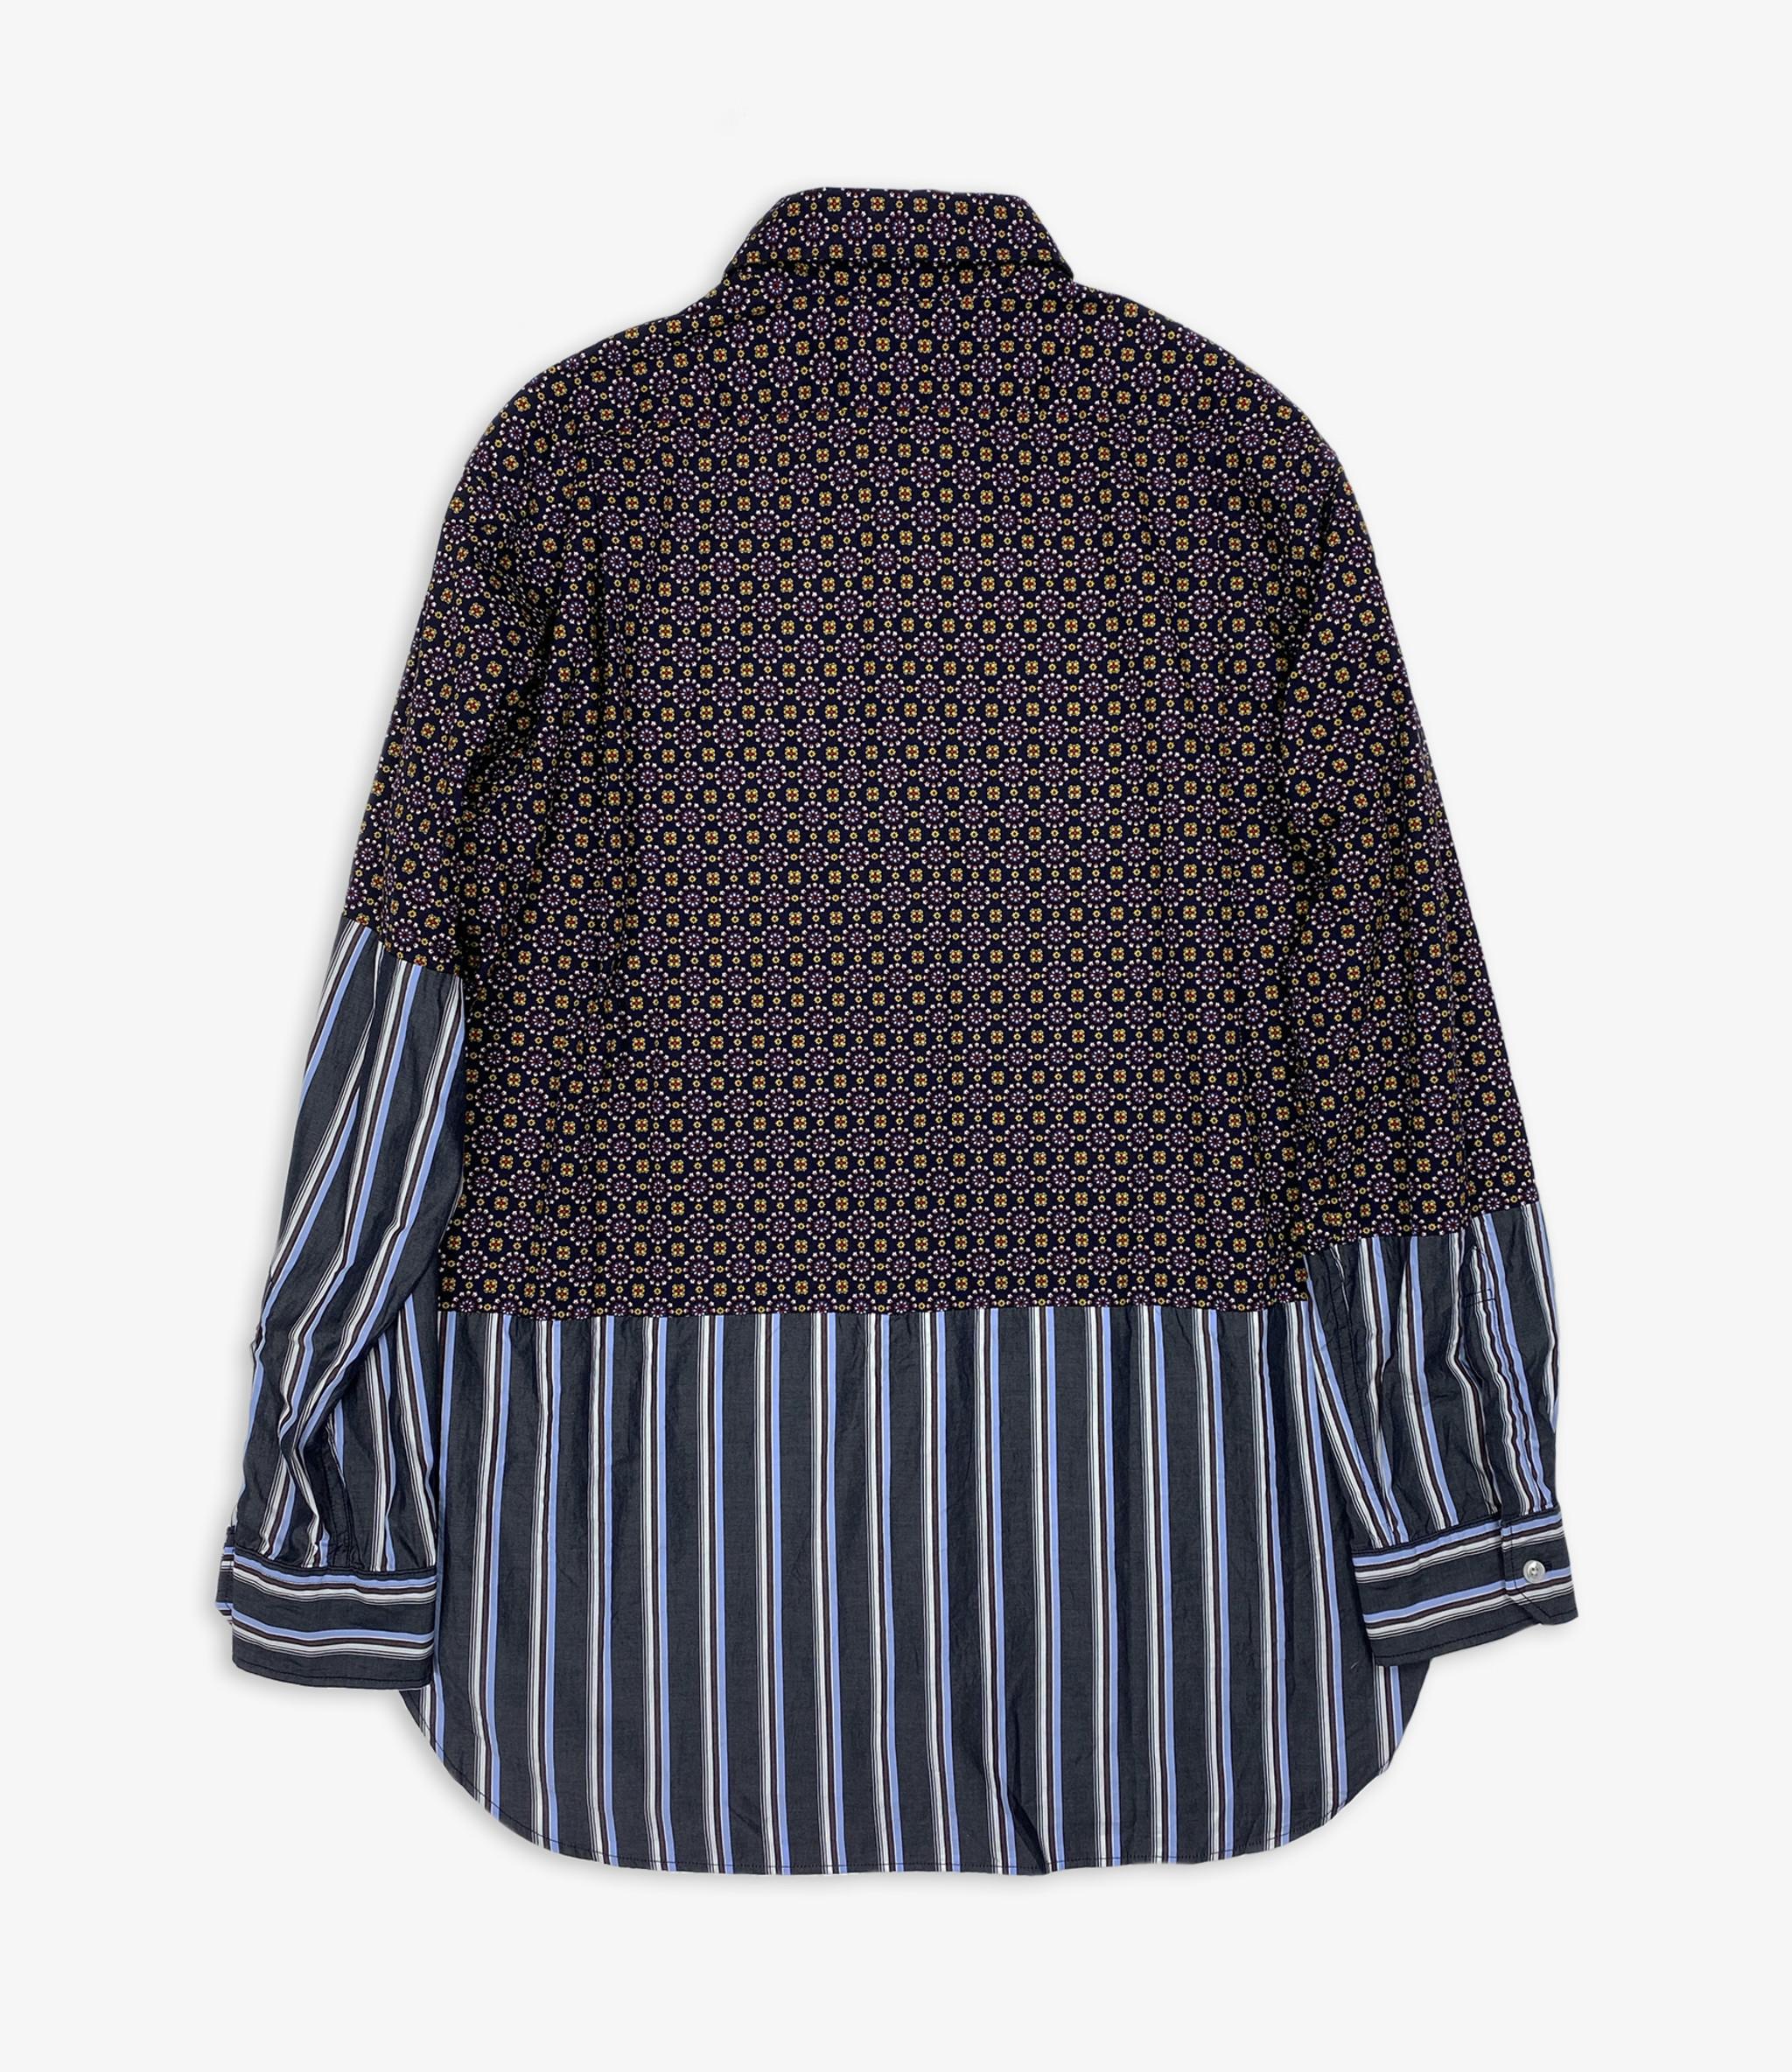 Engineered Garments EG / Spread Collar Shirt - Navy Floral Foulard Print